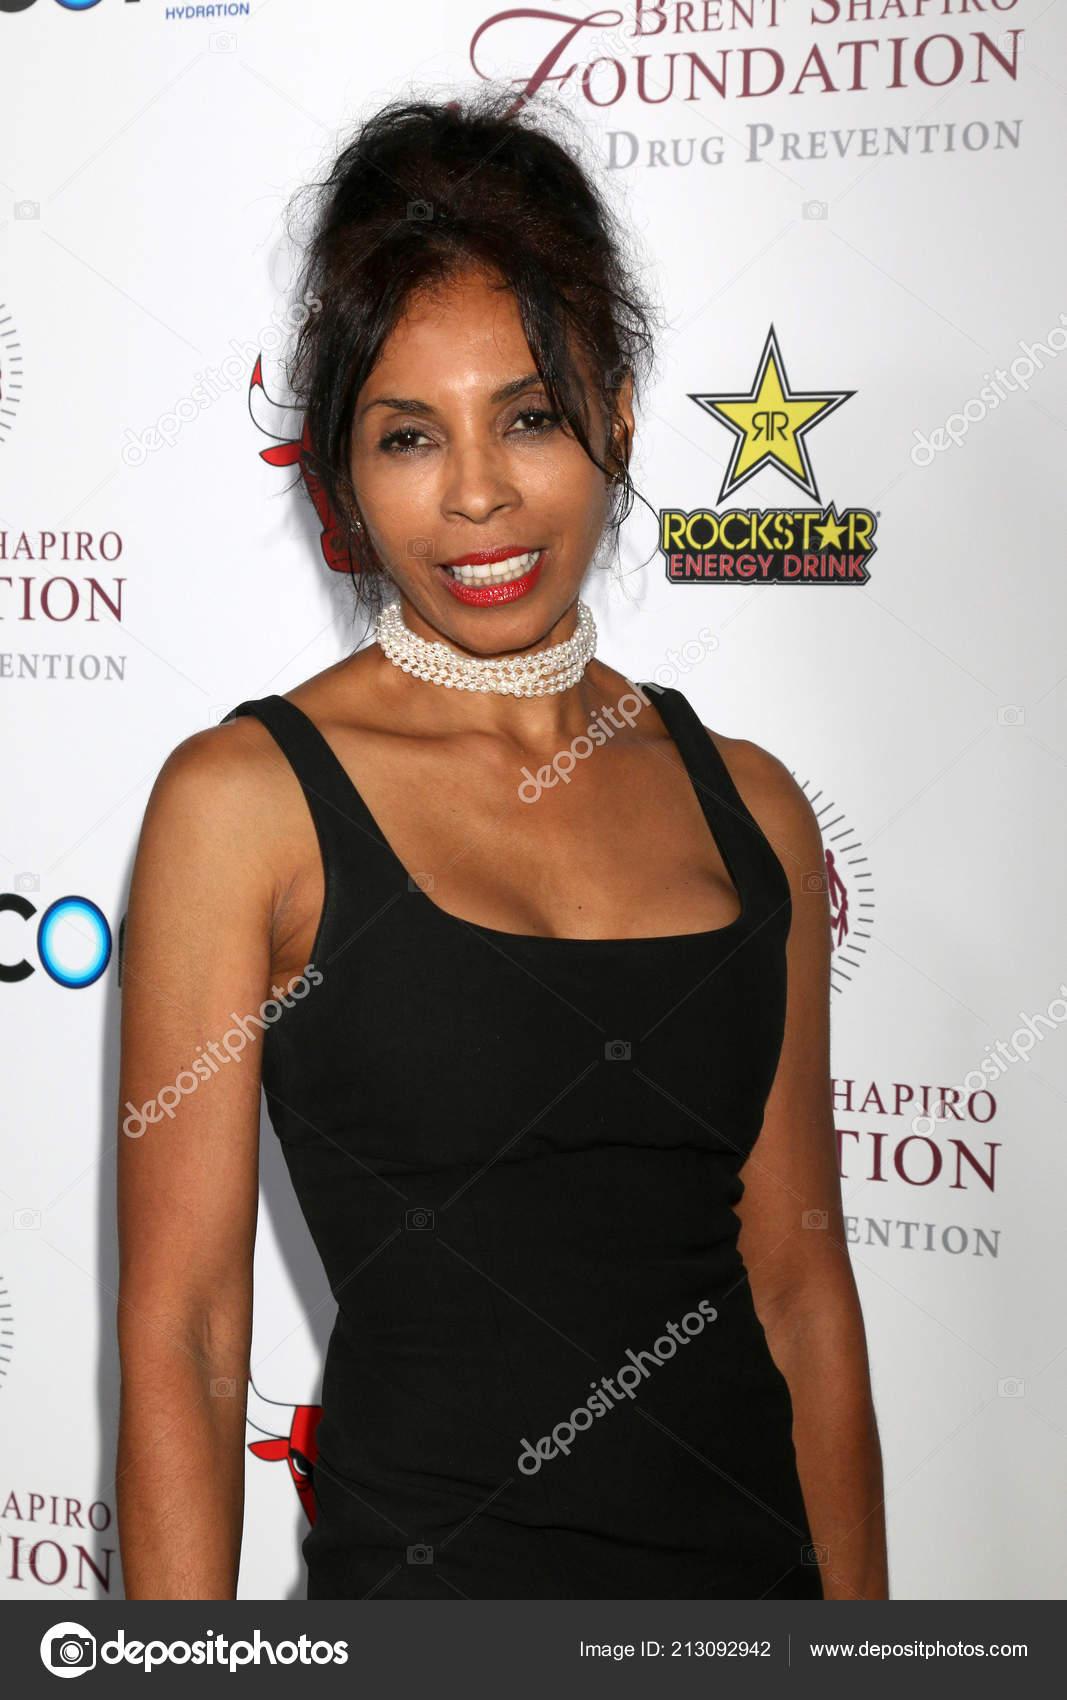 Andi Muise CAN 3 2005?007,Marcia Haufrecht Erotic clip Geraldine Viswanathan,Paddi Edwards